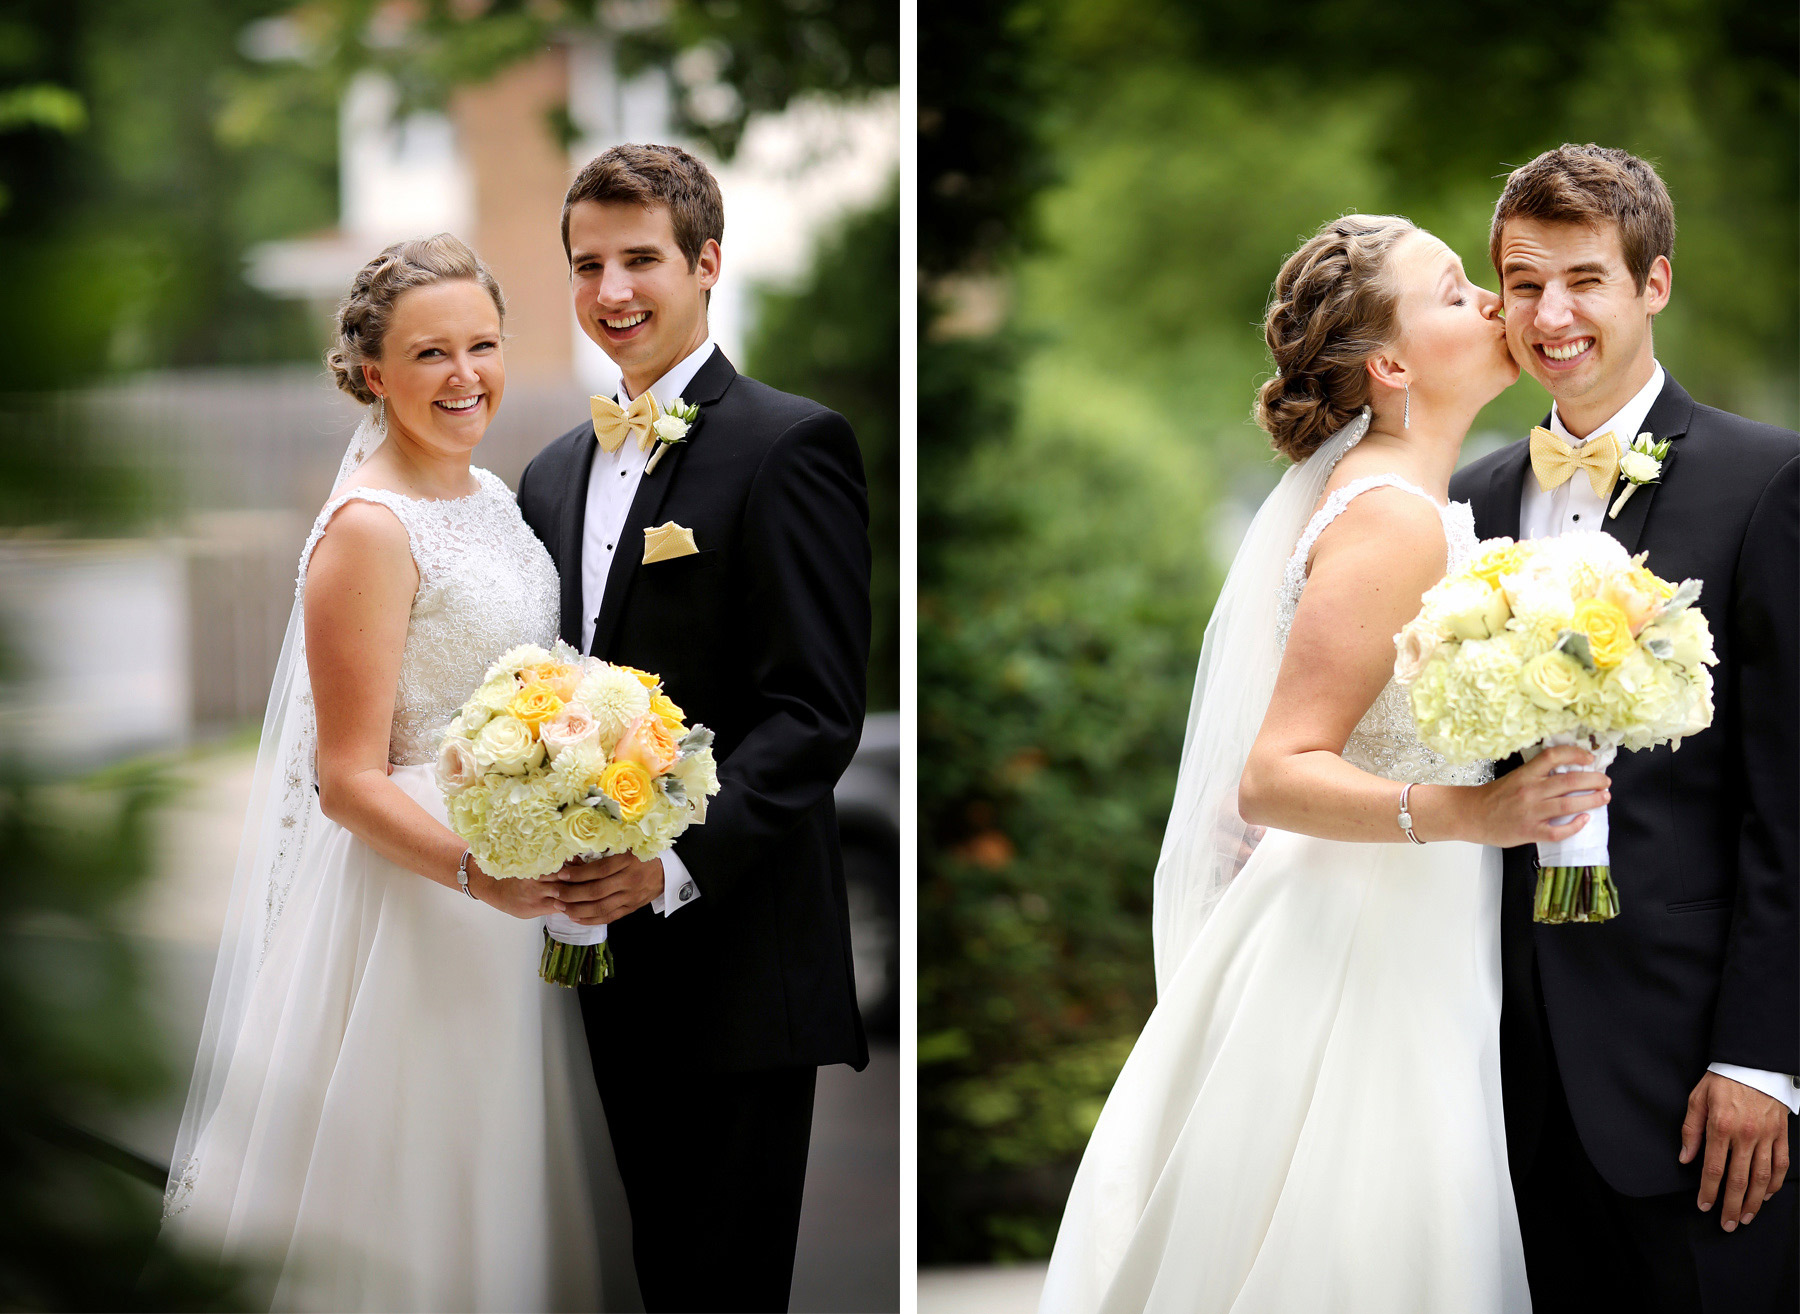 04-Minneapolis-Minnesota-Wedding-Photography-by-Vick-Photography-Edina-First-Look-Grace-&-Nick.jpg